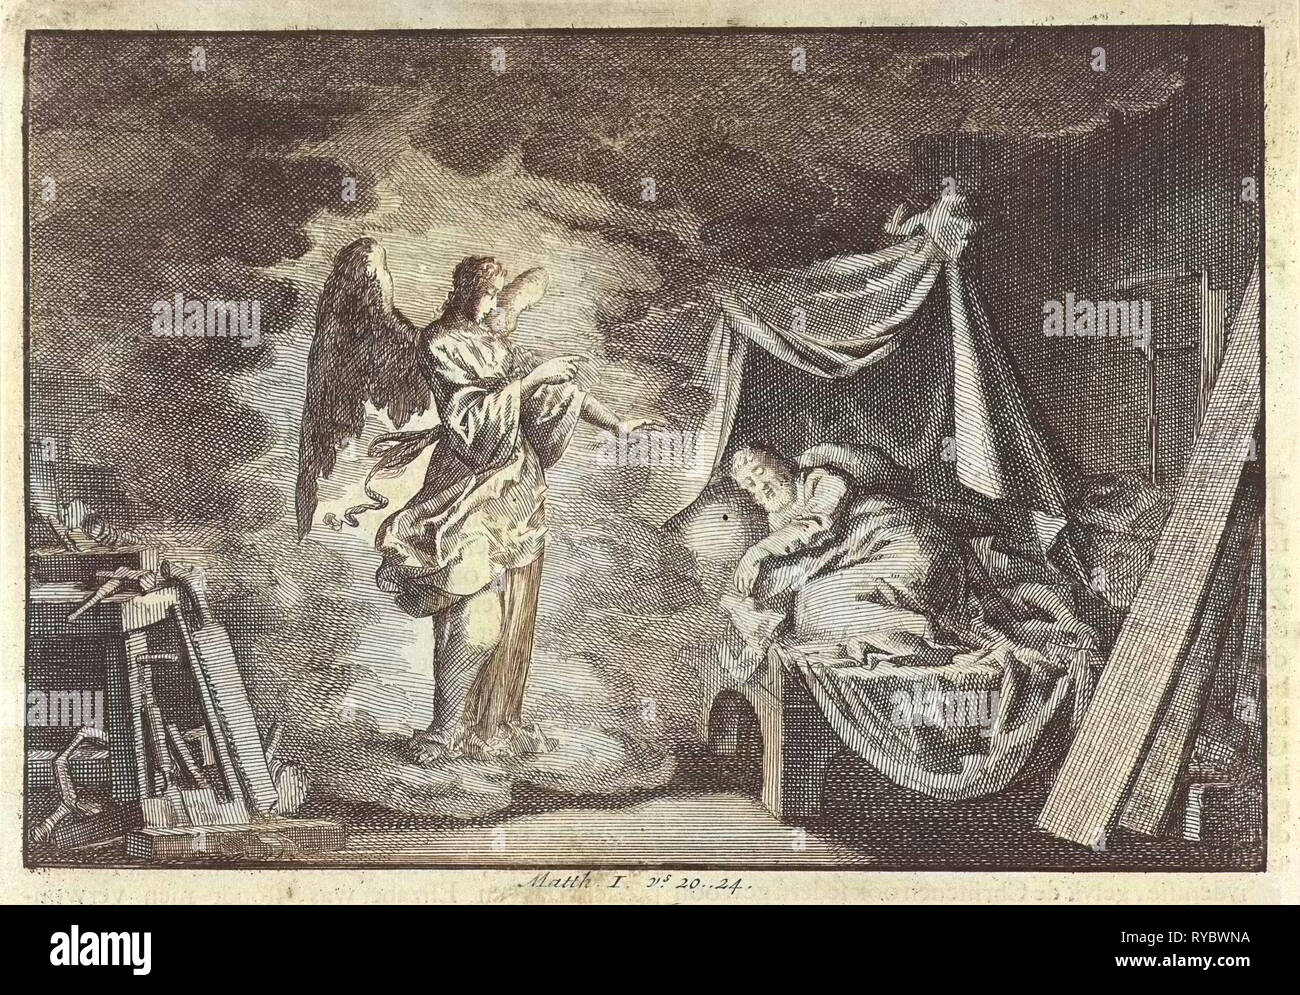 Angel appears to Joseph in his carpentry workshop, Jan Luyken, Pieter Mortier, 1703 - 1762 - Stock Image